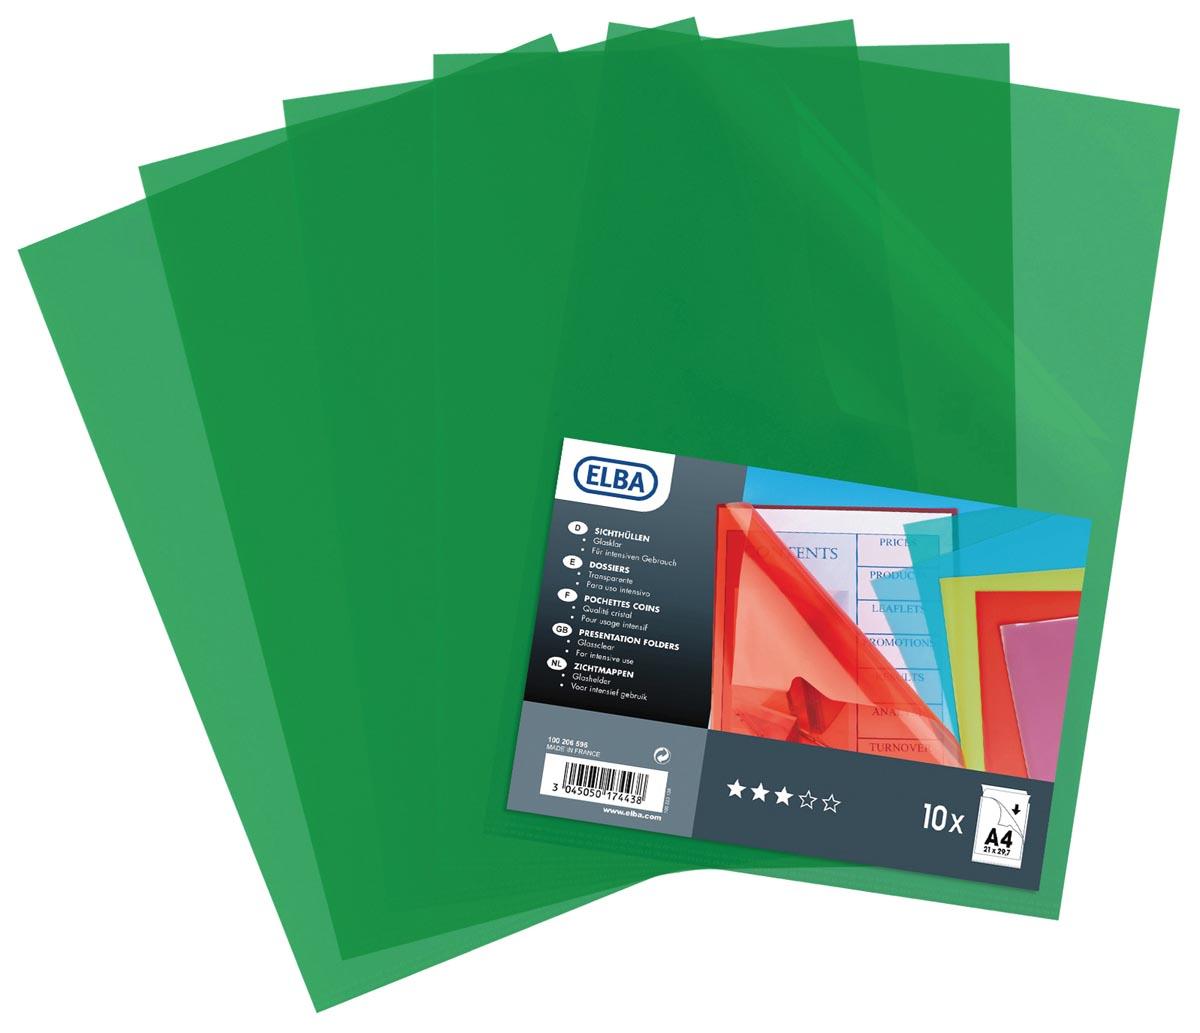 Elba L-map A4, PP, 120 micron, transparant groen, pak van 10 stuks